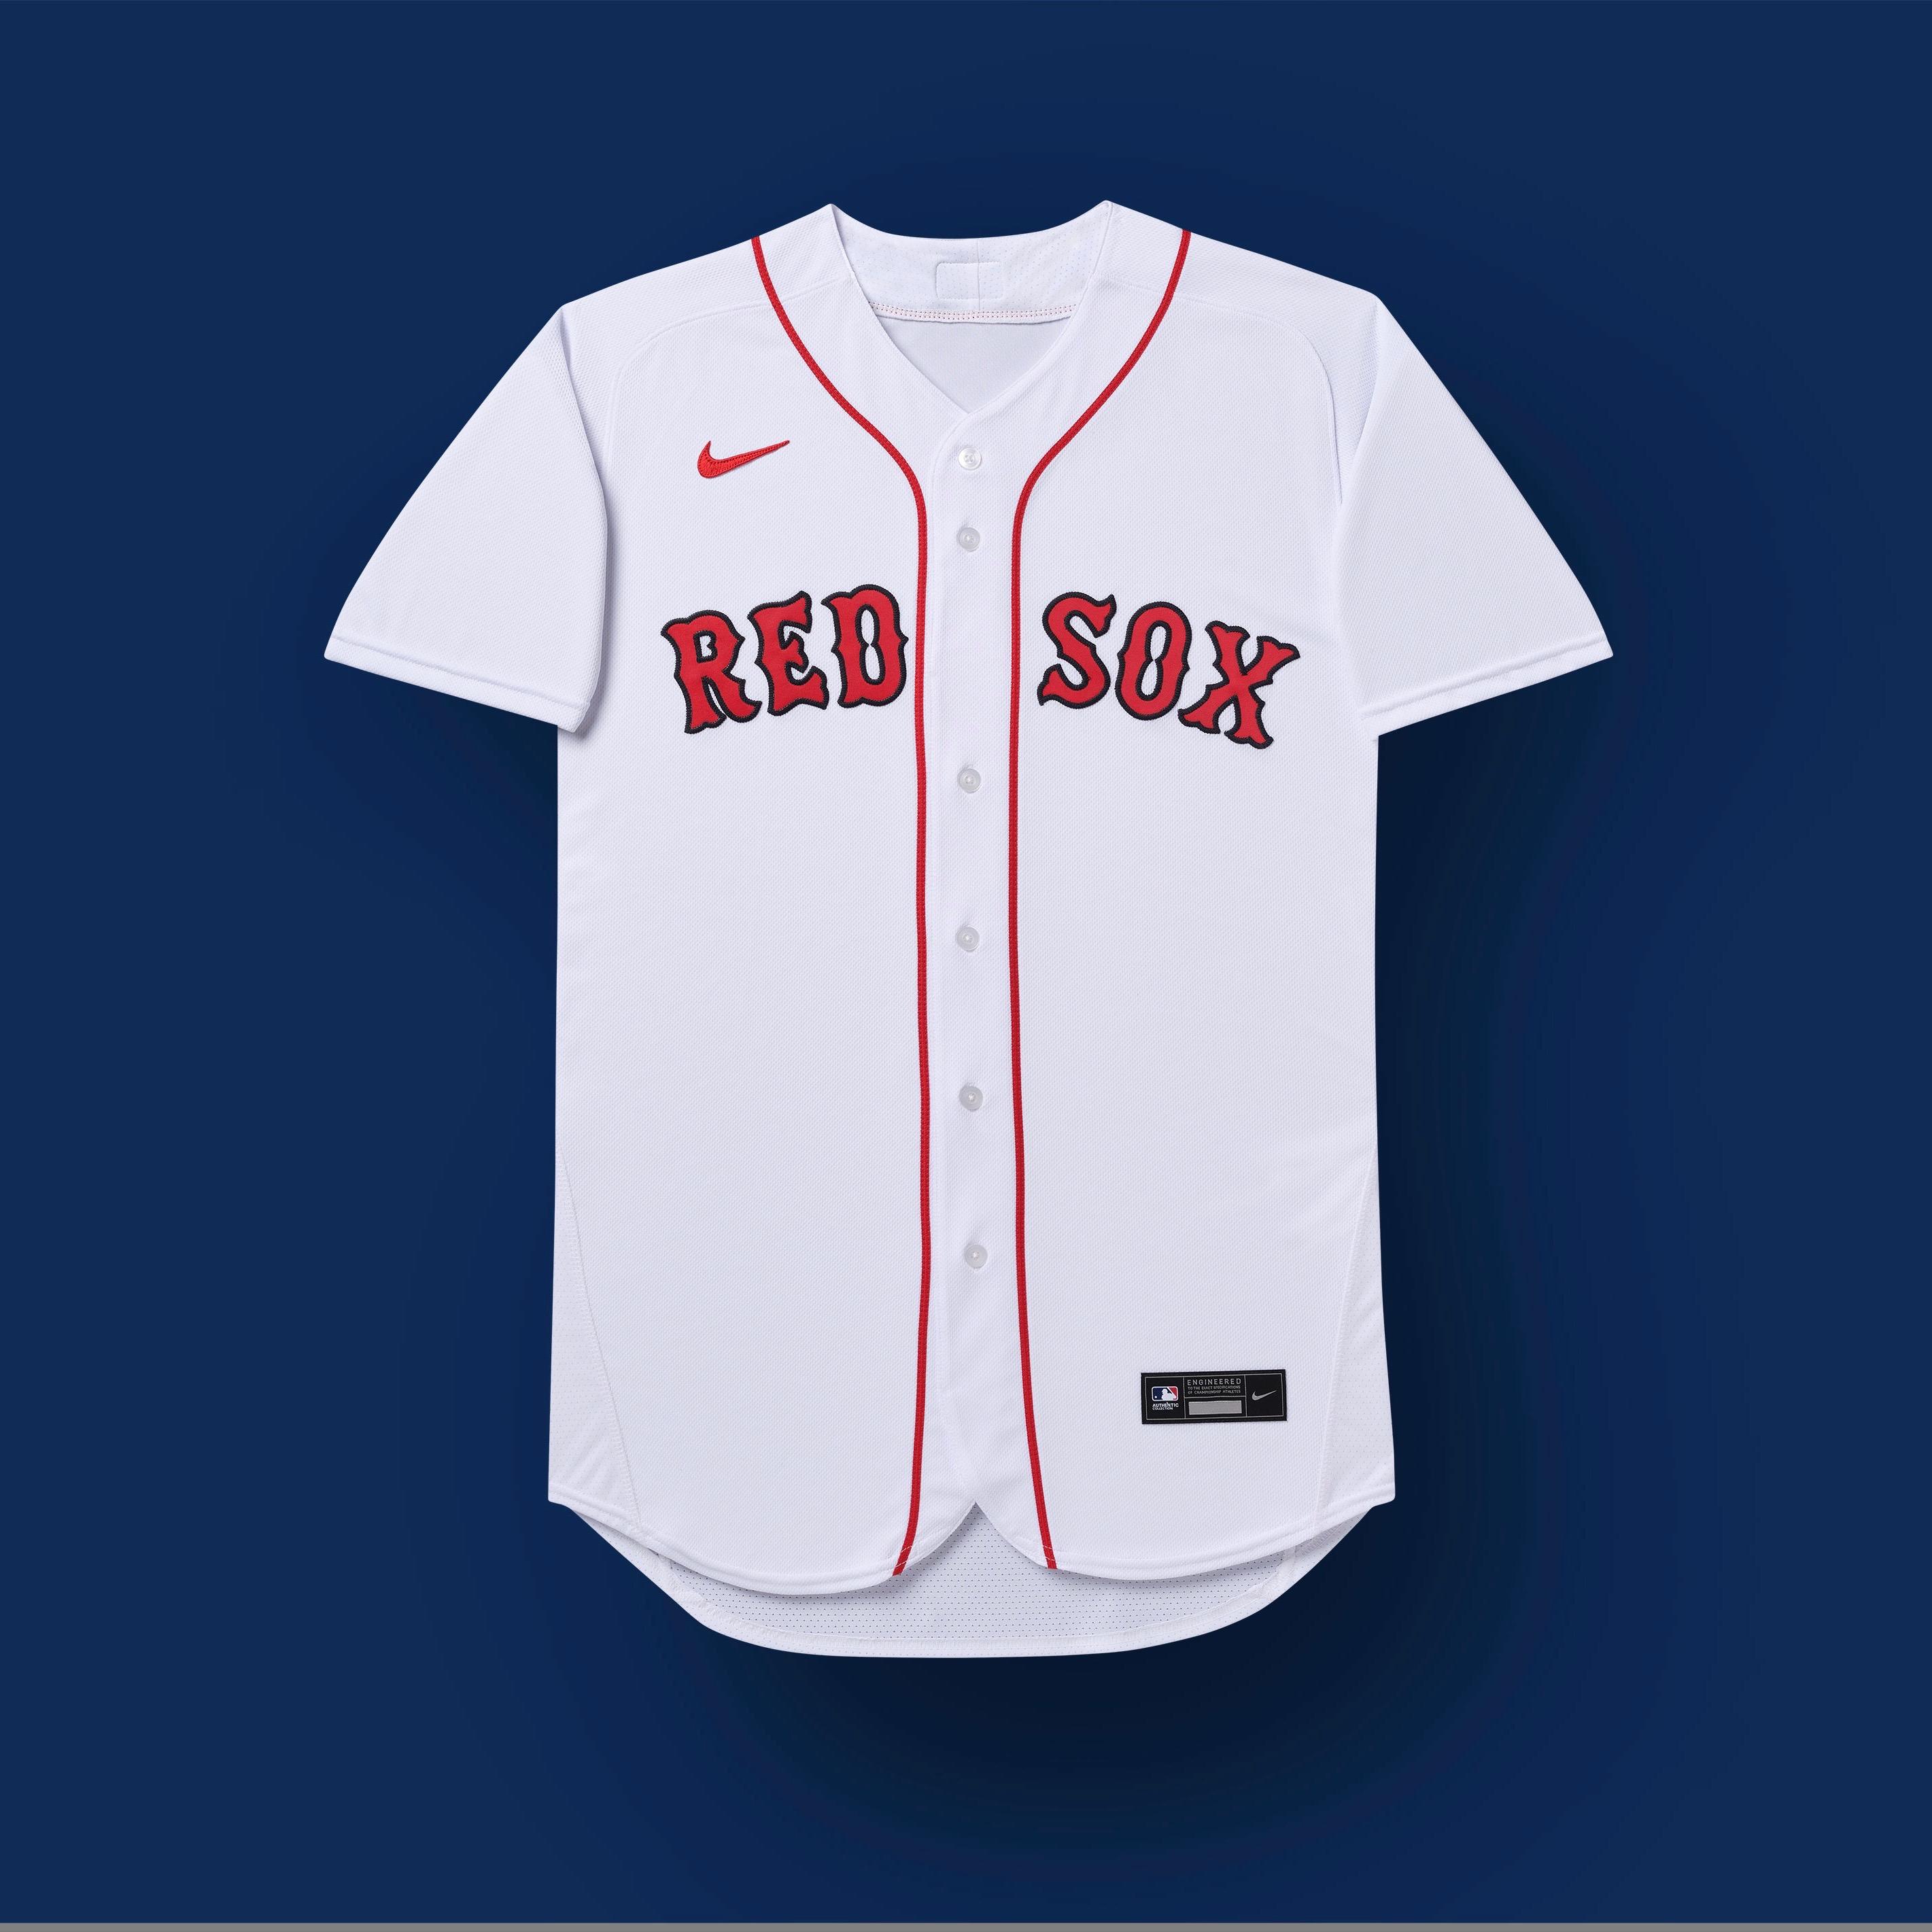 boston red sox 2020 uniforms